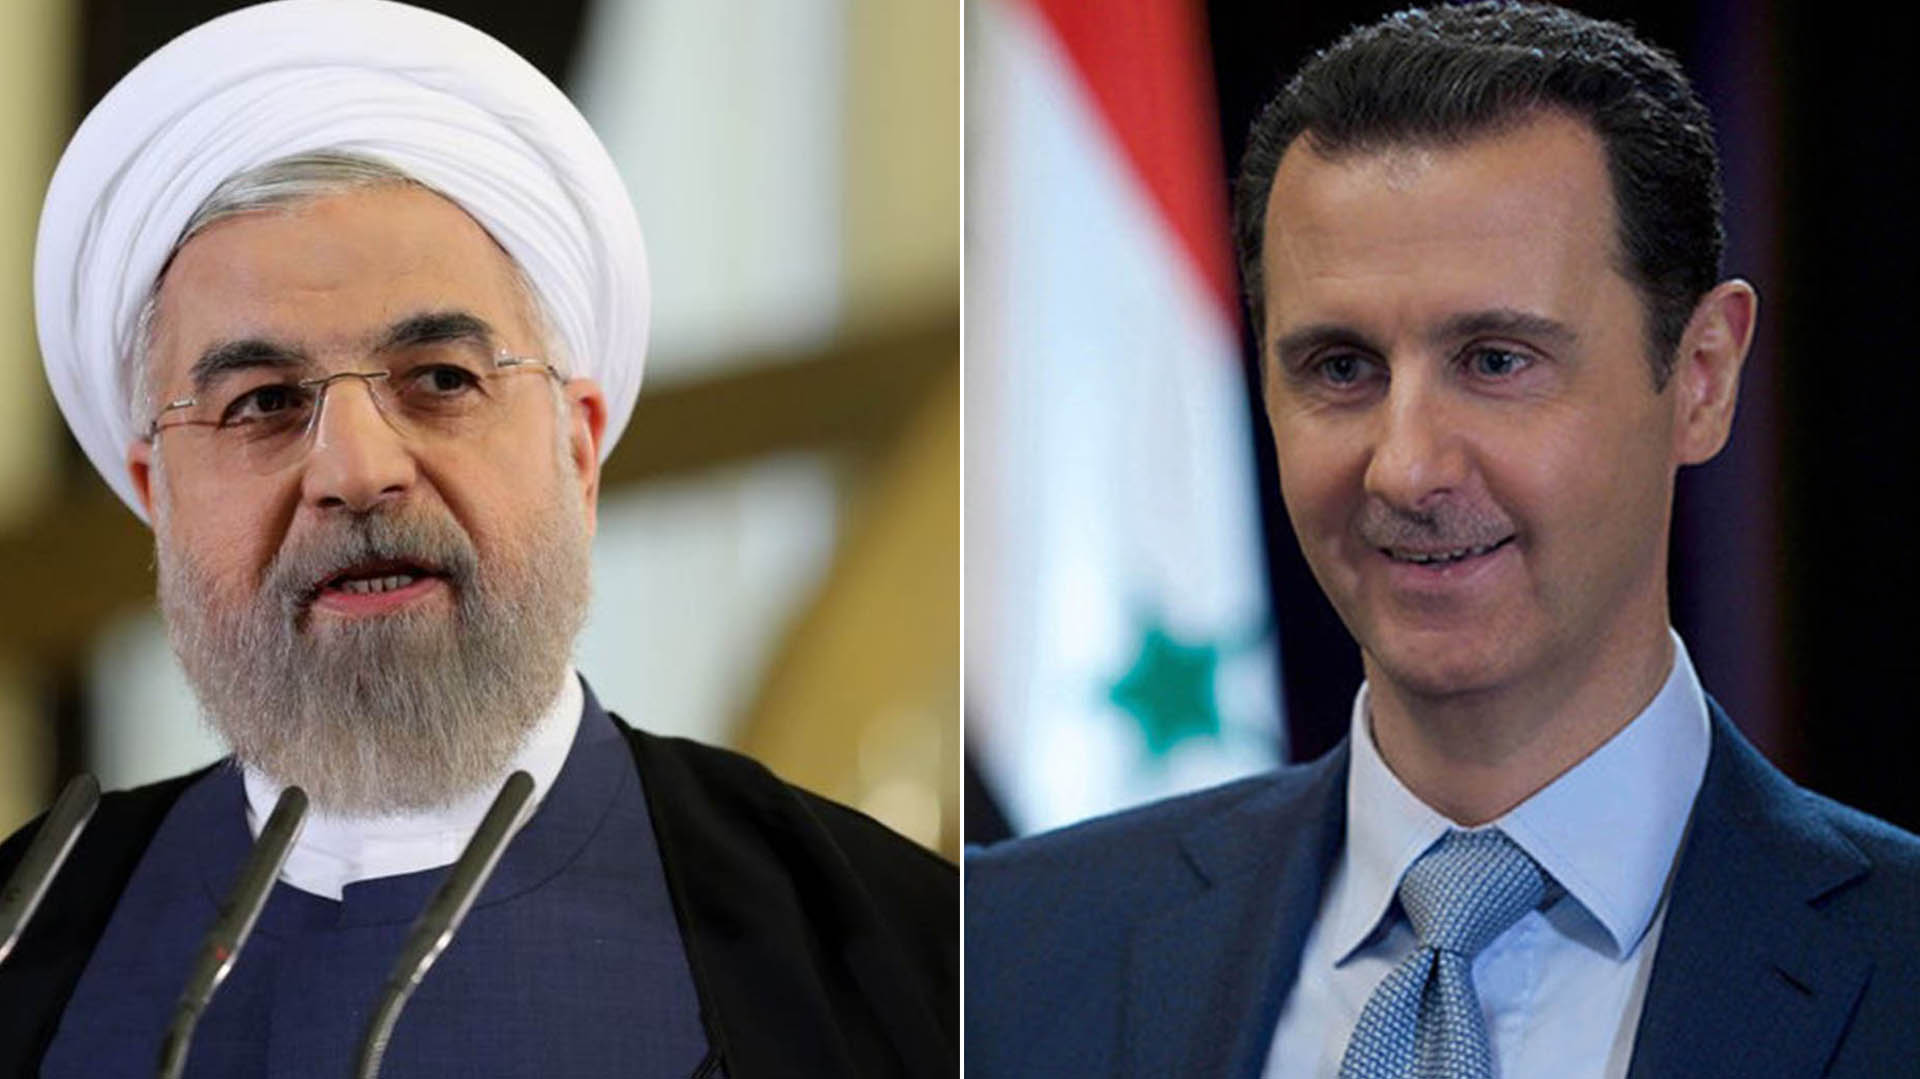 Hasan Rohani, presidente de Irán, y Bashar al Assad, dictador en Siria